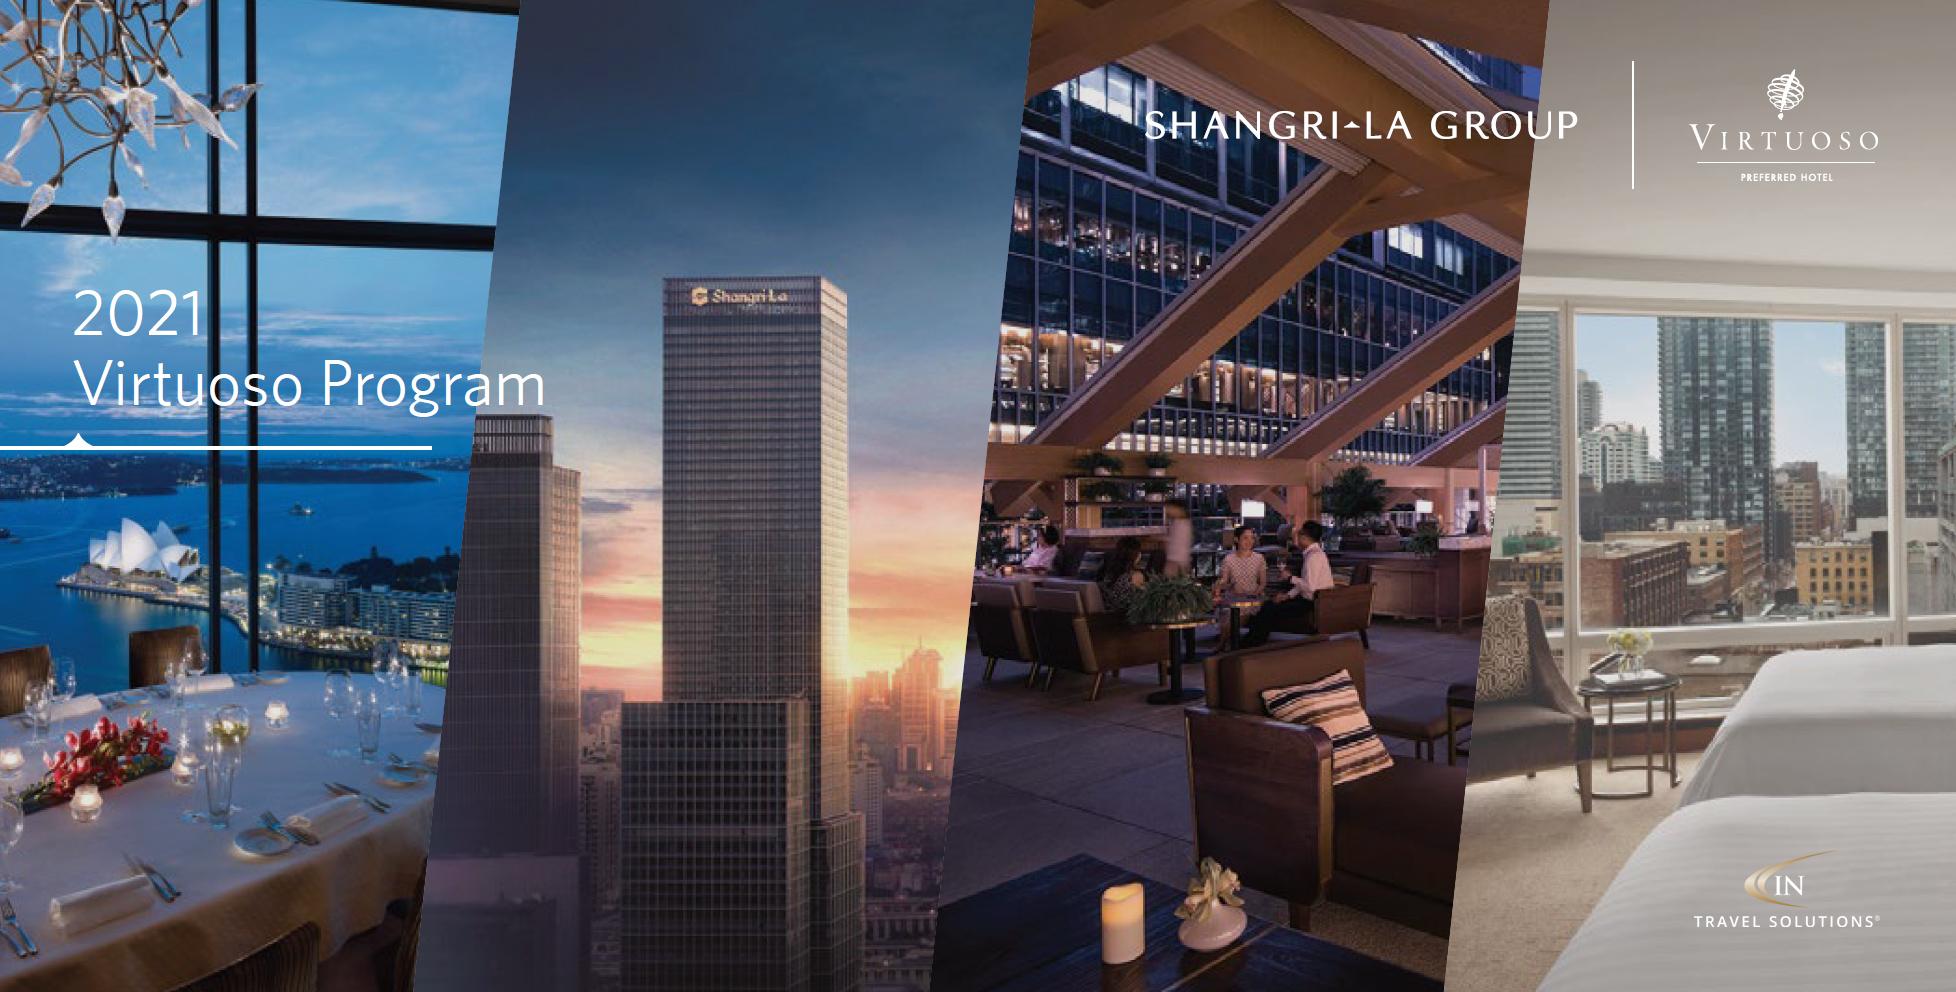 In Travel Solutions Frankfurt Shangri-La Virtuoso Program Sheet 2021